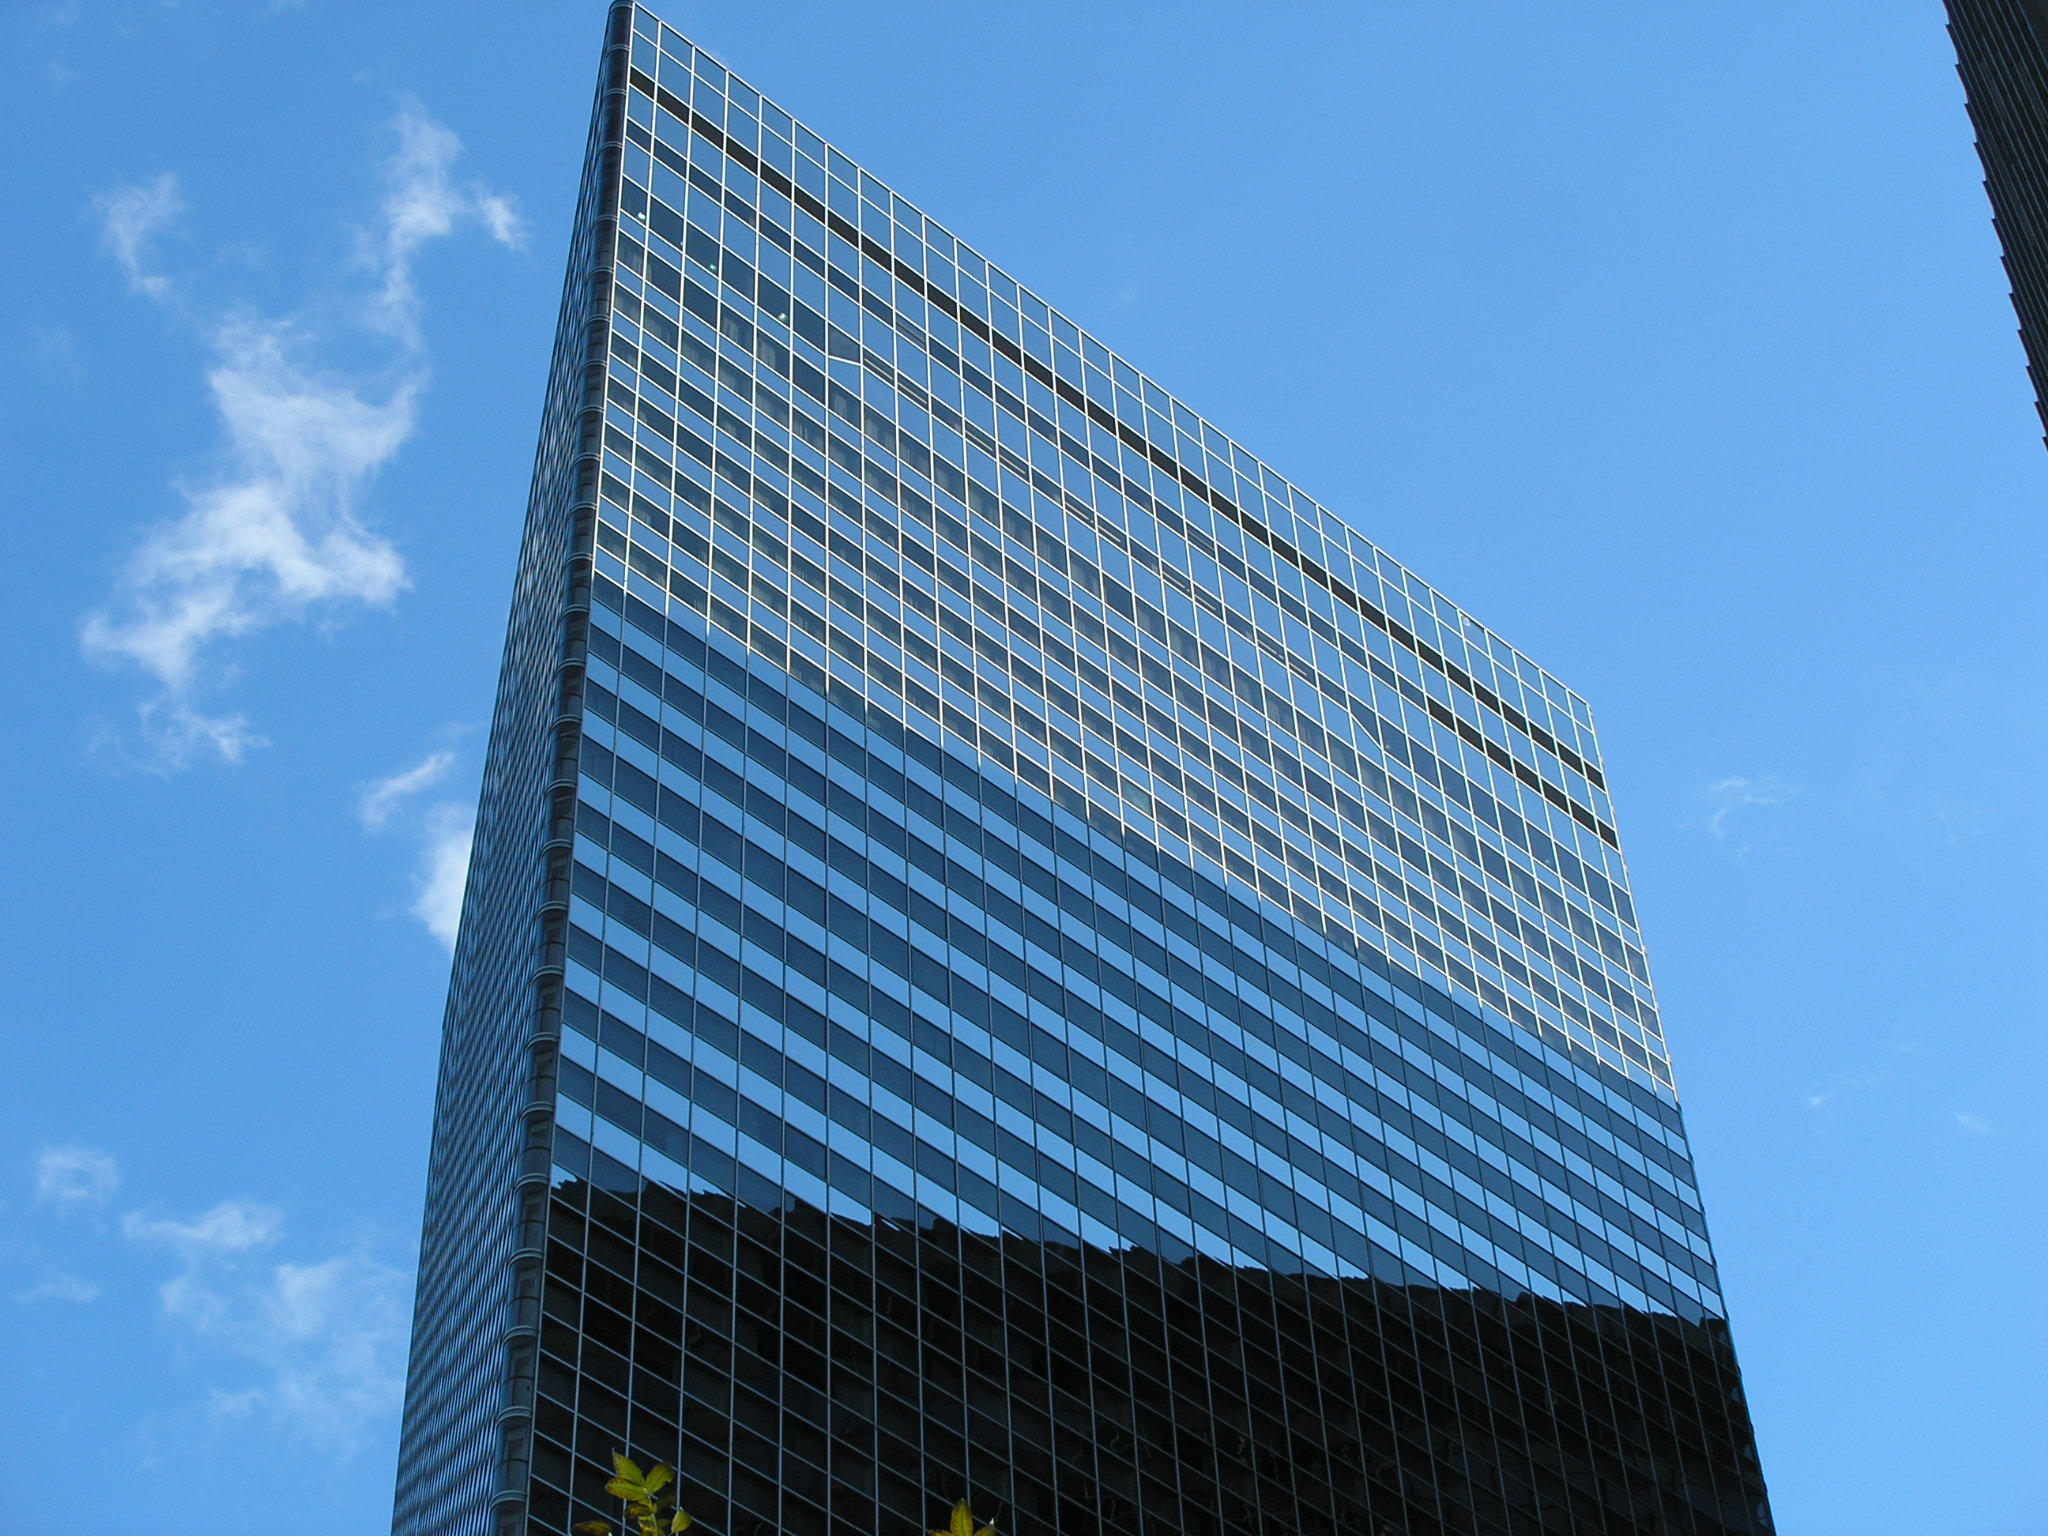 File:Triangular Building (Chicago).JPG